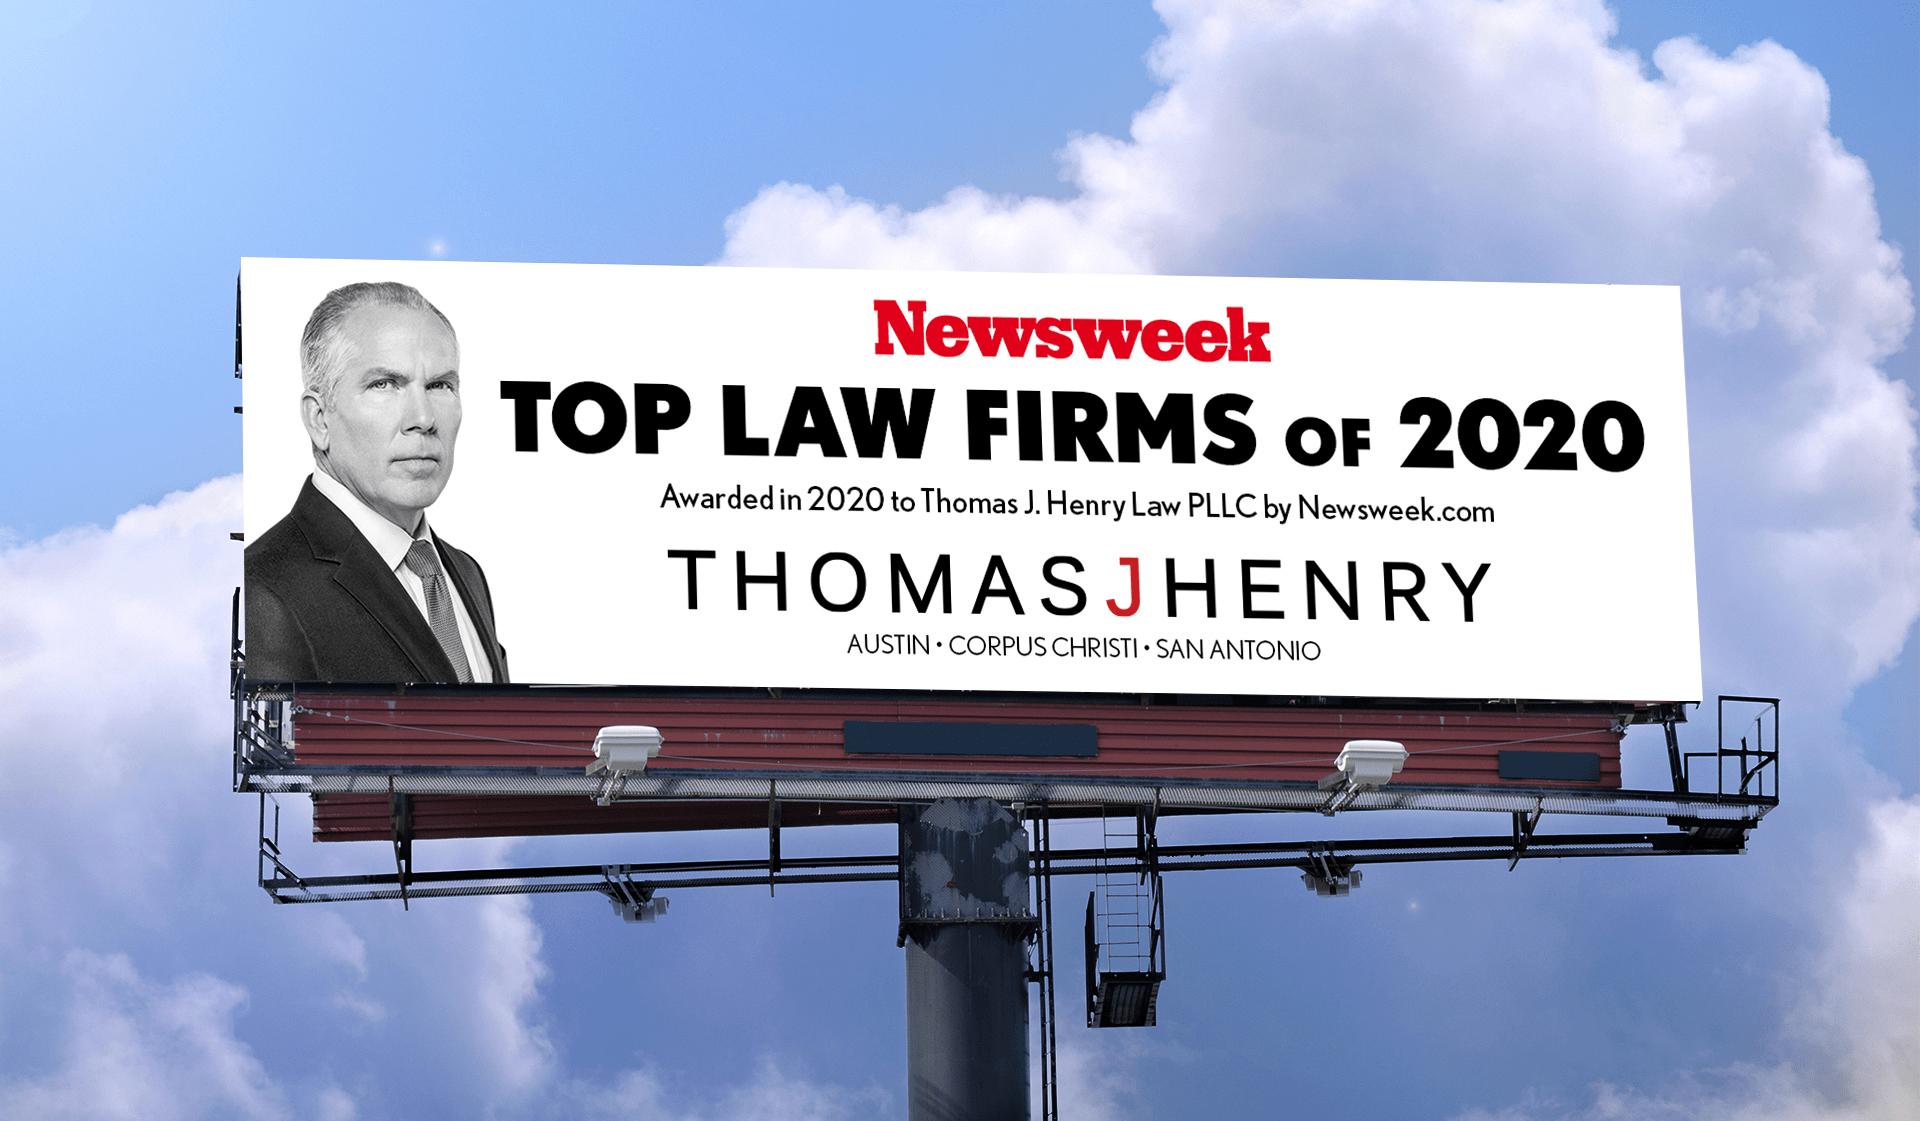 TJH Newswire Billboard